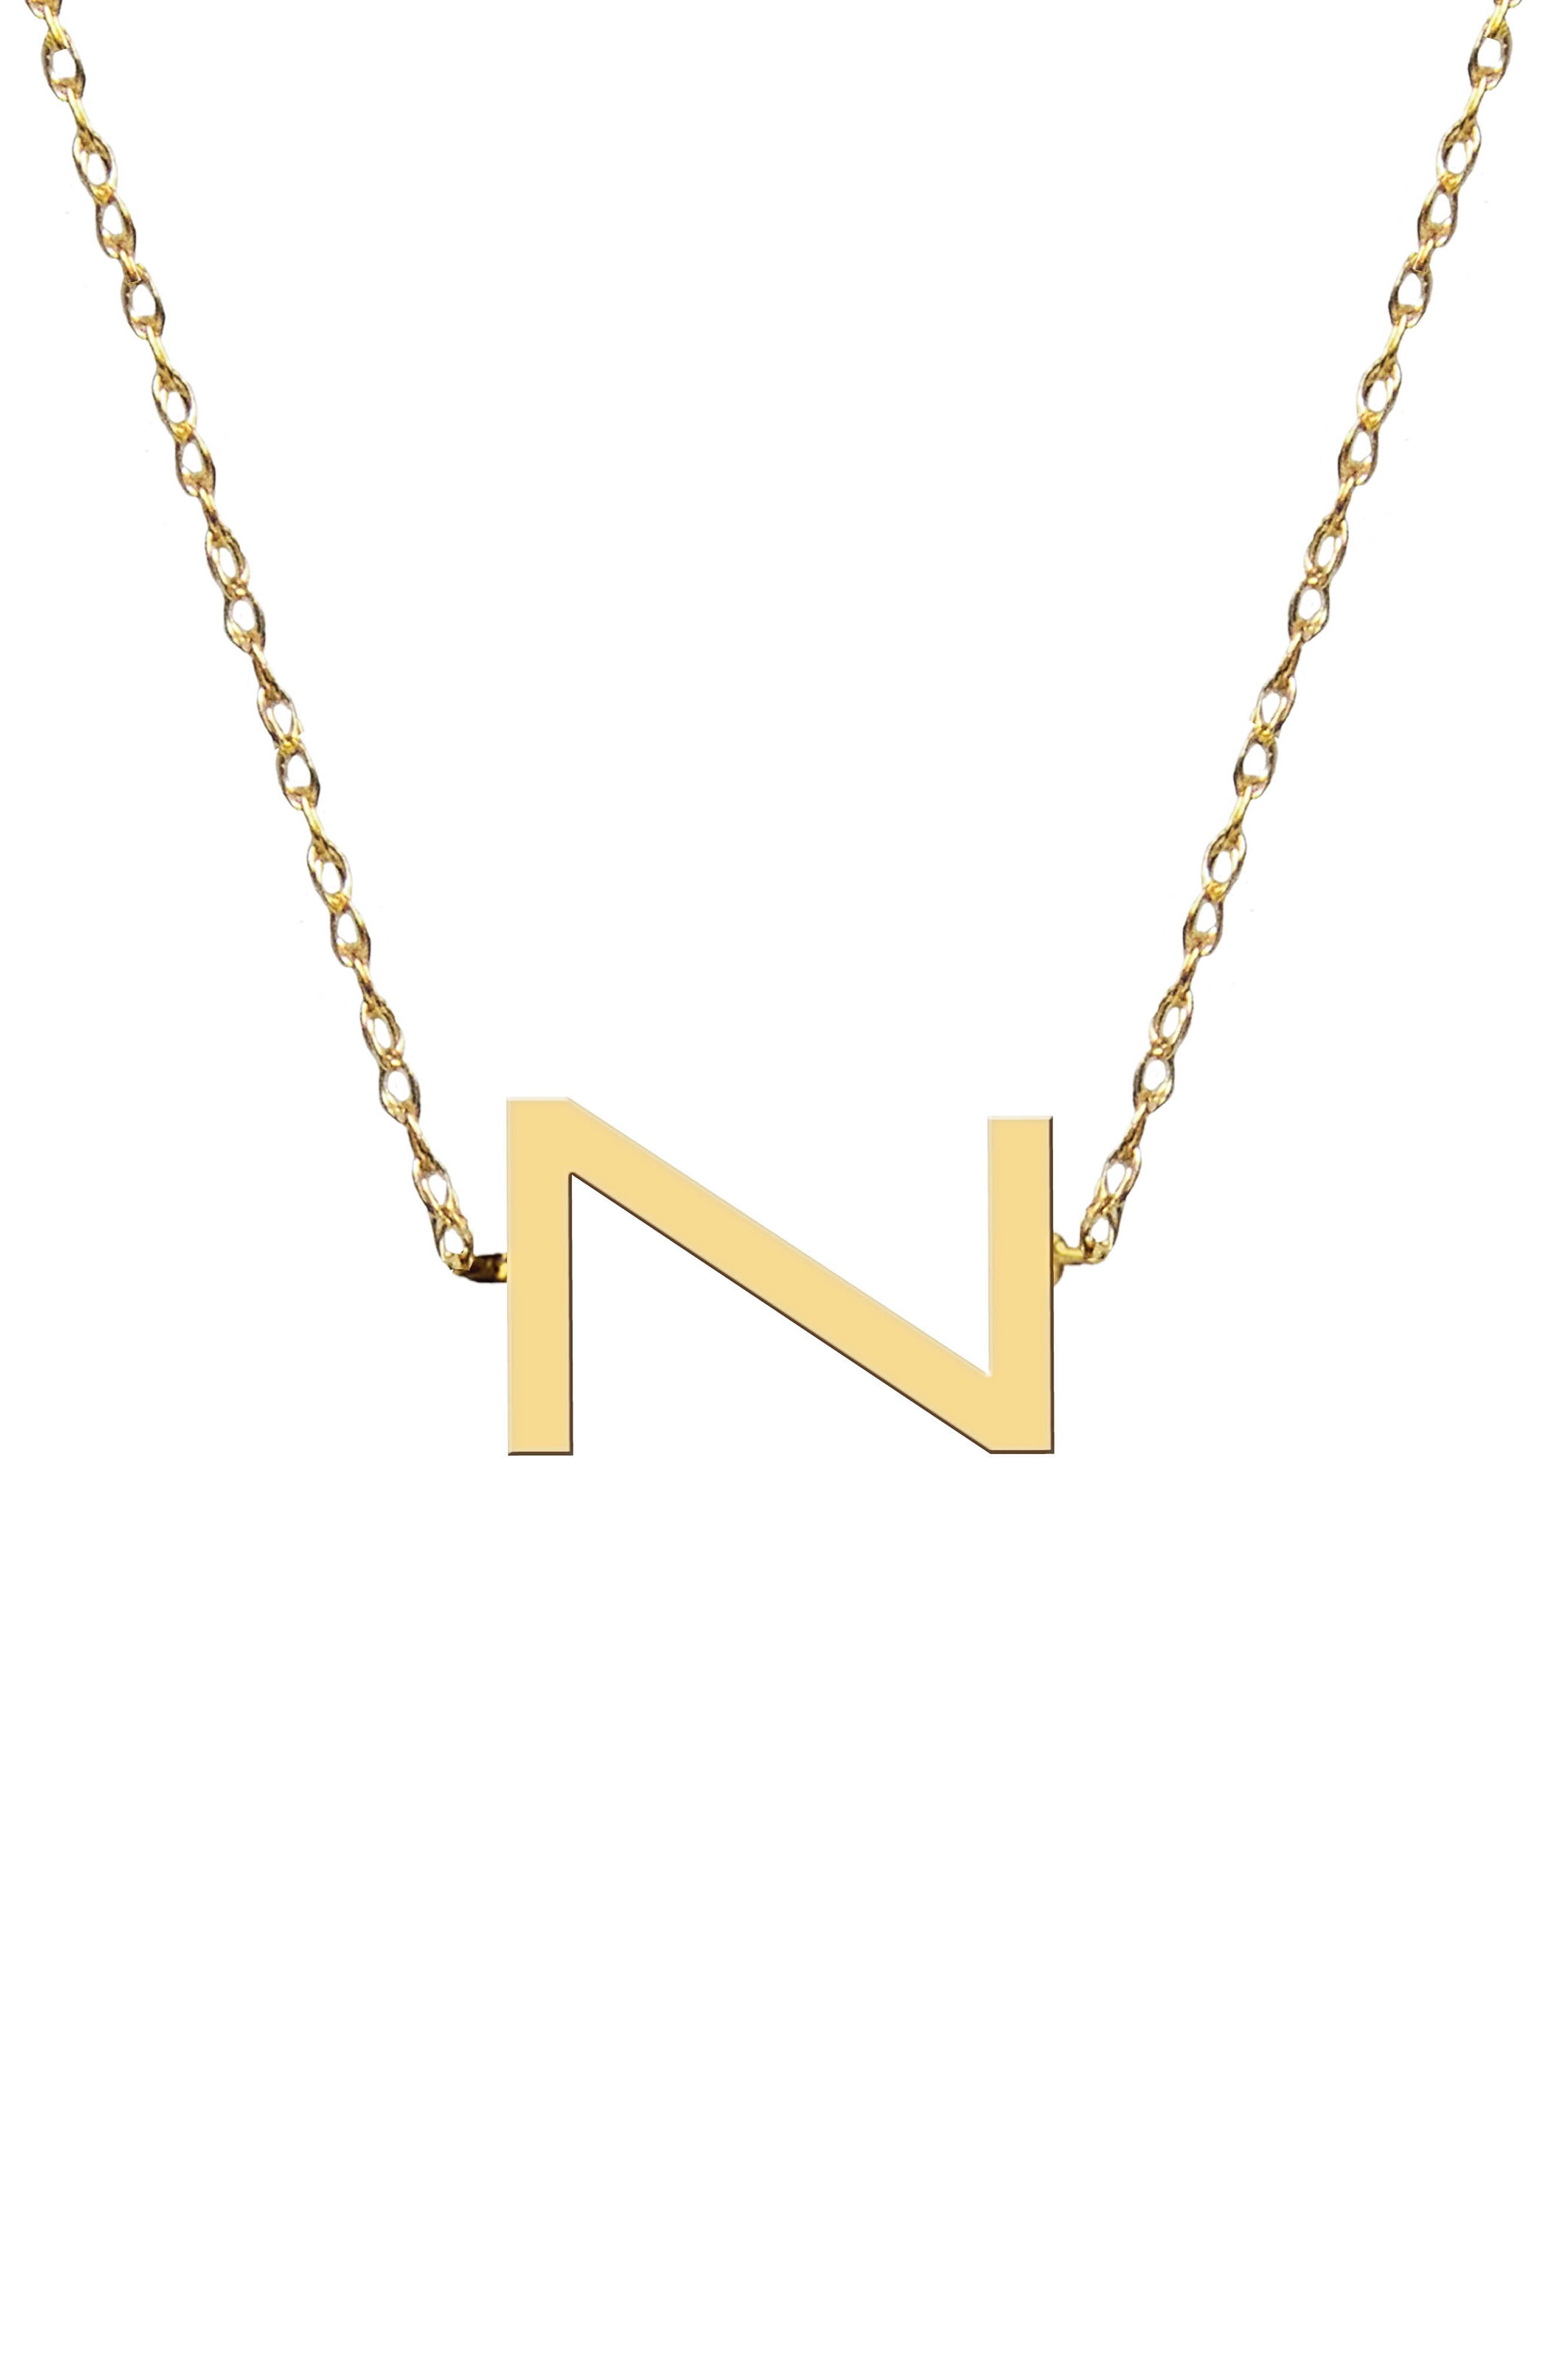 JANE BASCH DESIGNS Sideways Block Initial Pendant Necklace